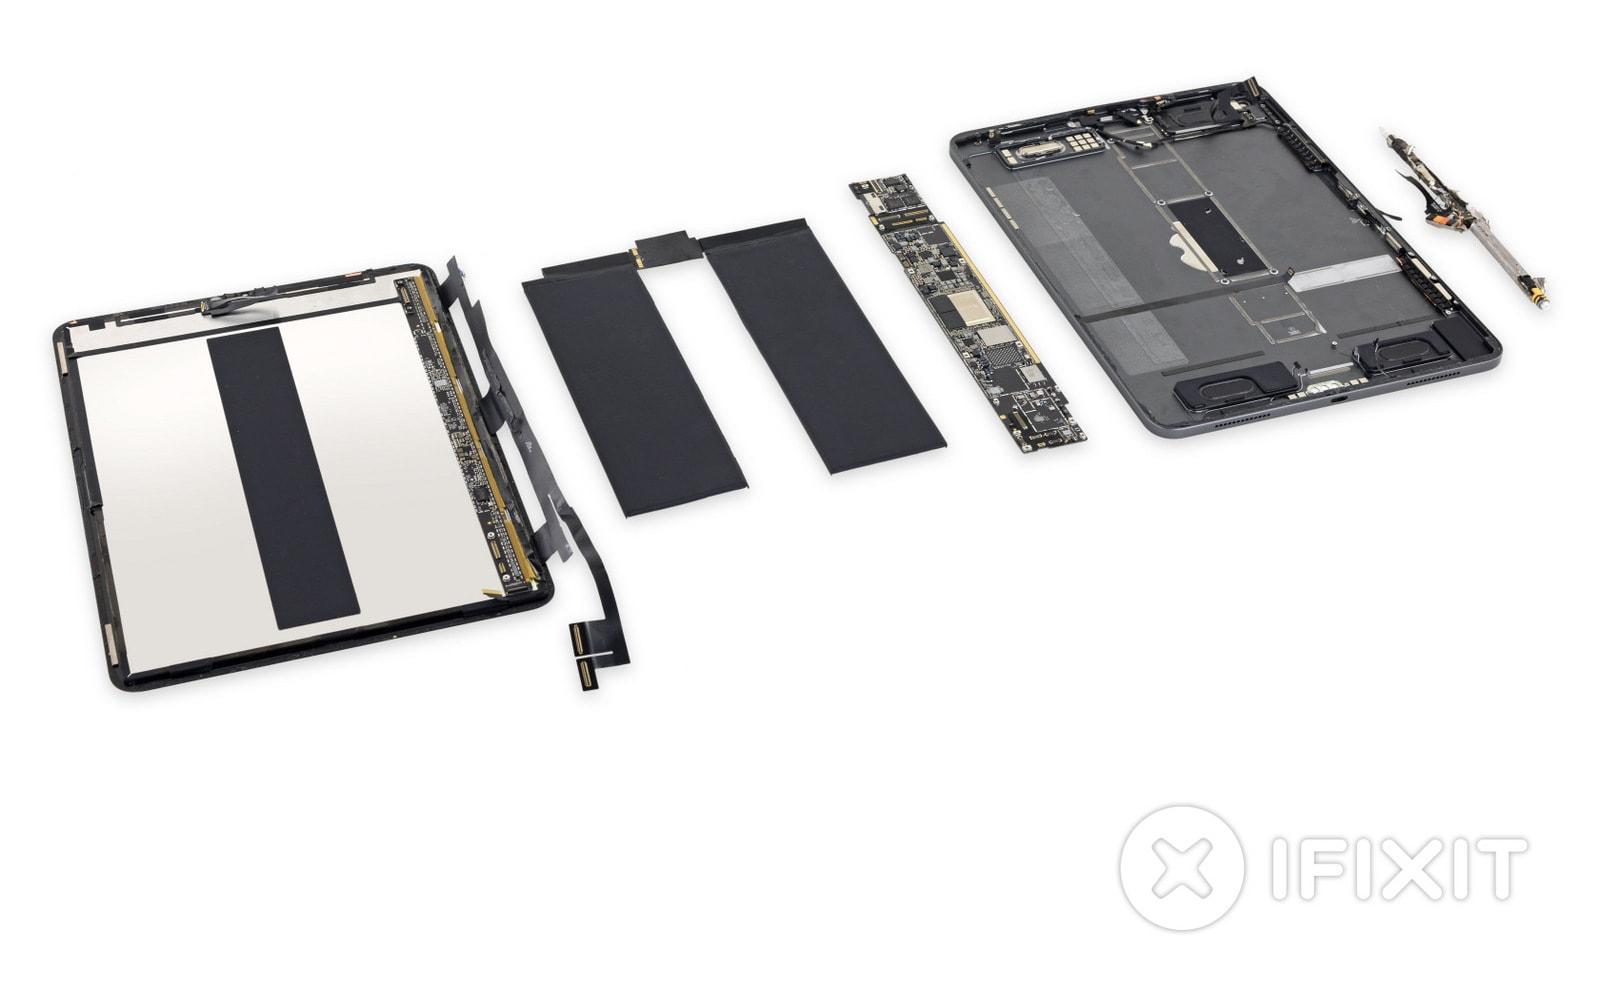 2018 iPad Pro teardown